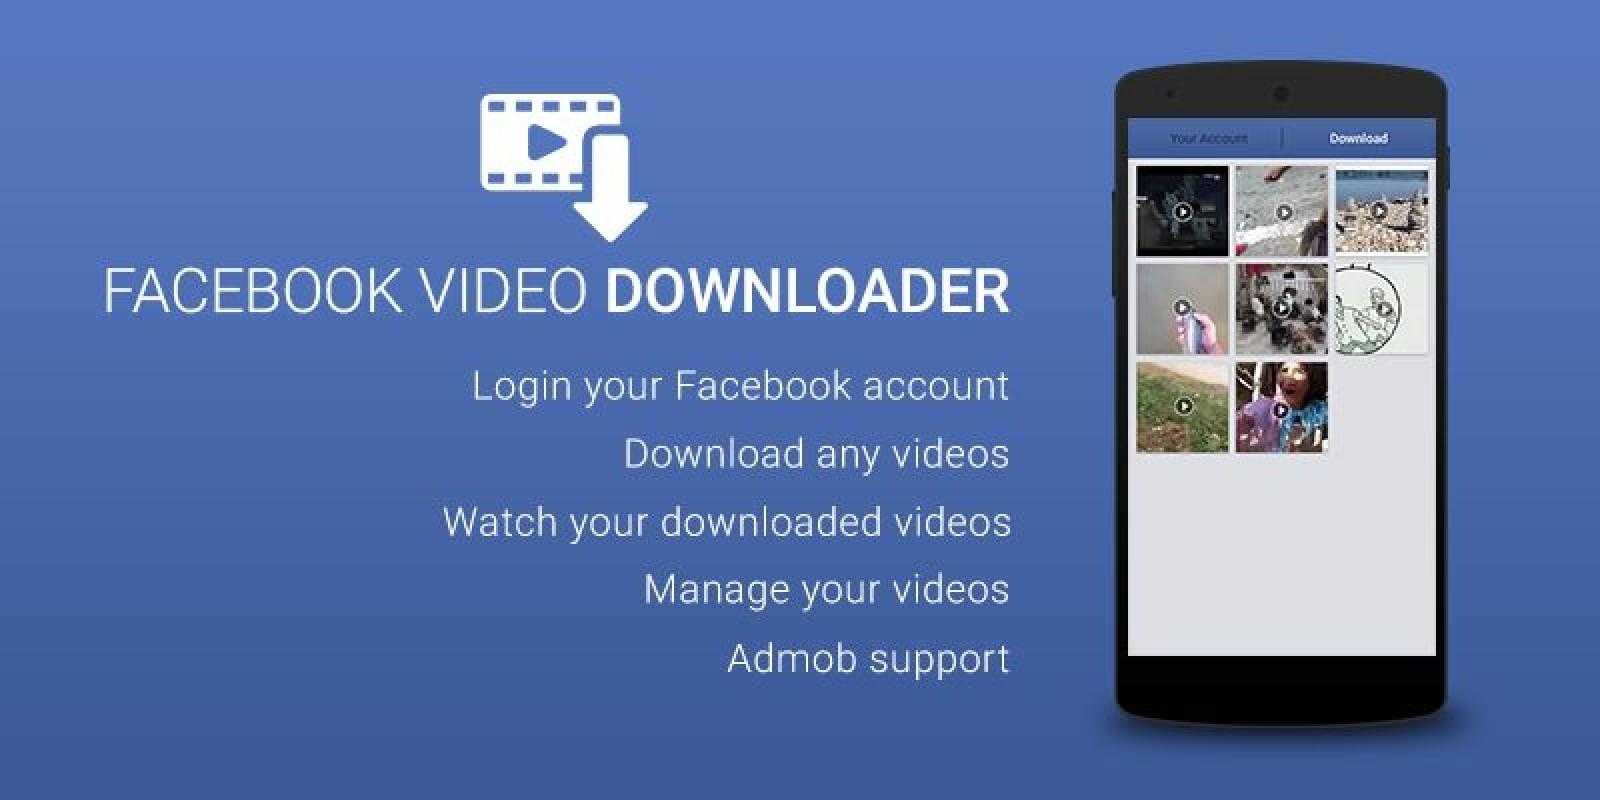 Download video downloader for facebook 2. 2. 3 apk for android.